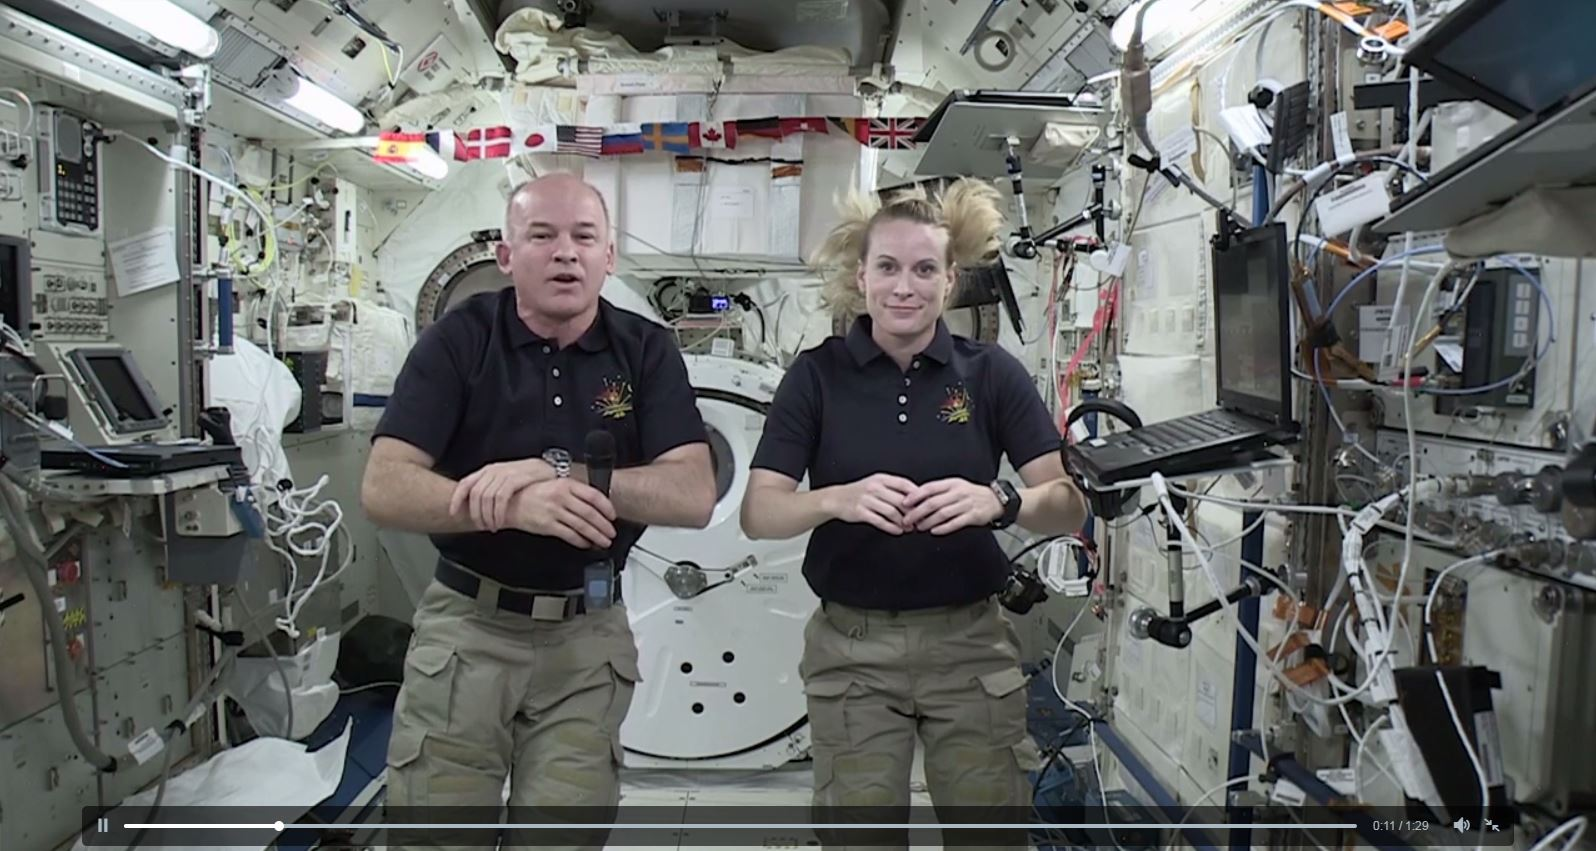 Astronauts on 2016 Olympics screenshot